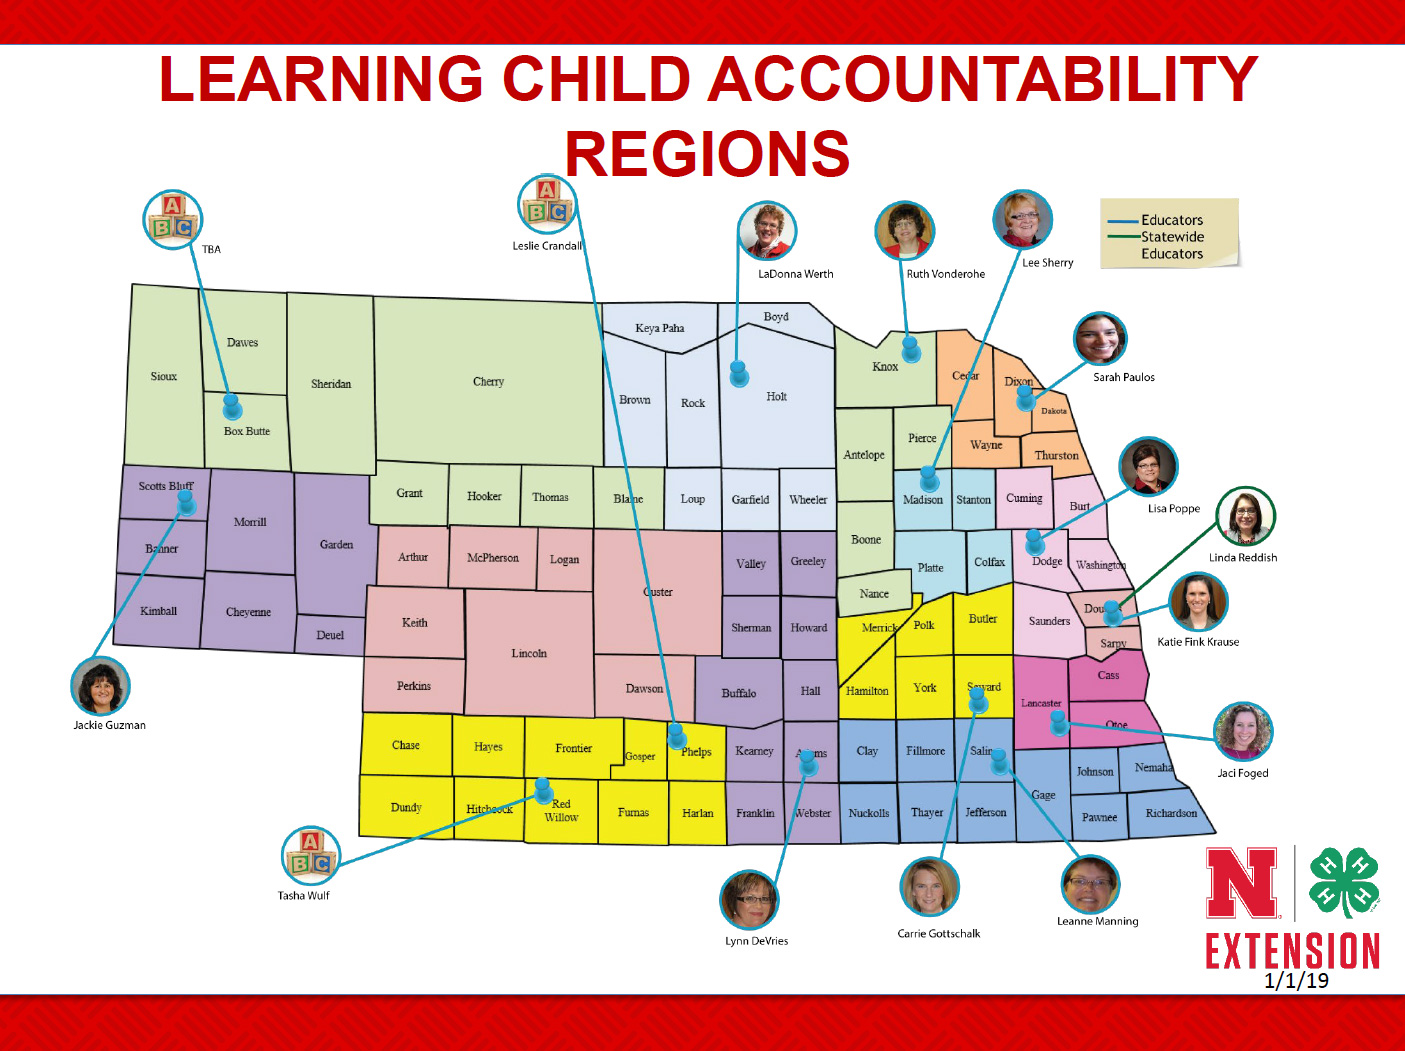 Map of educators